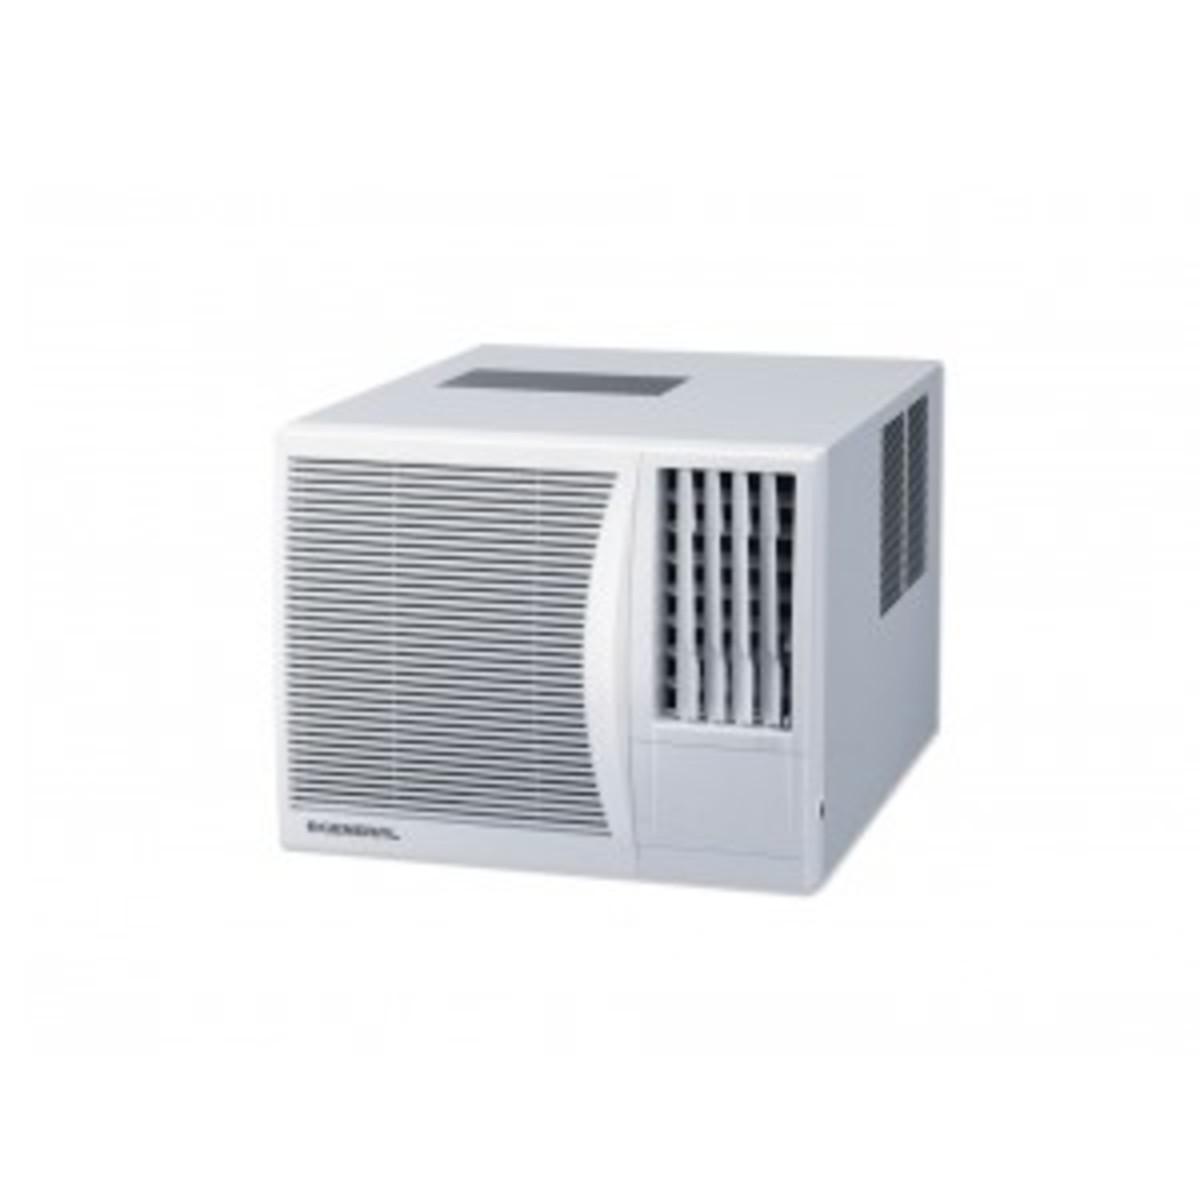 AKWA9FNR 1 HP Window Type Air Conditioner G1